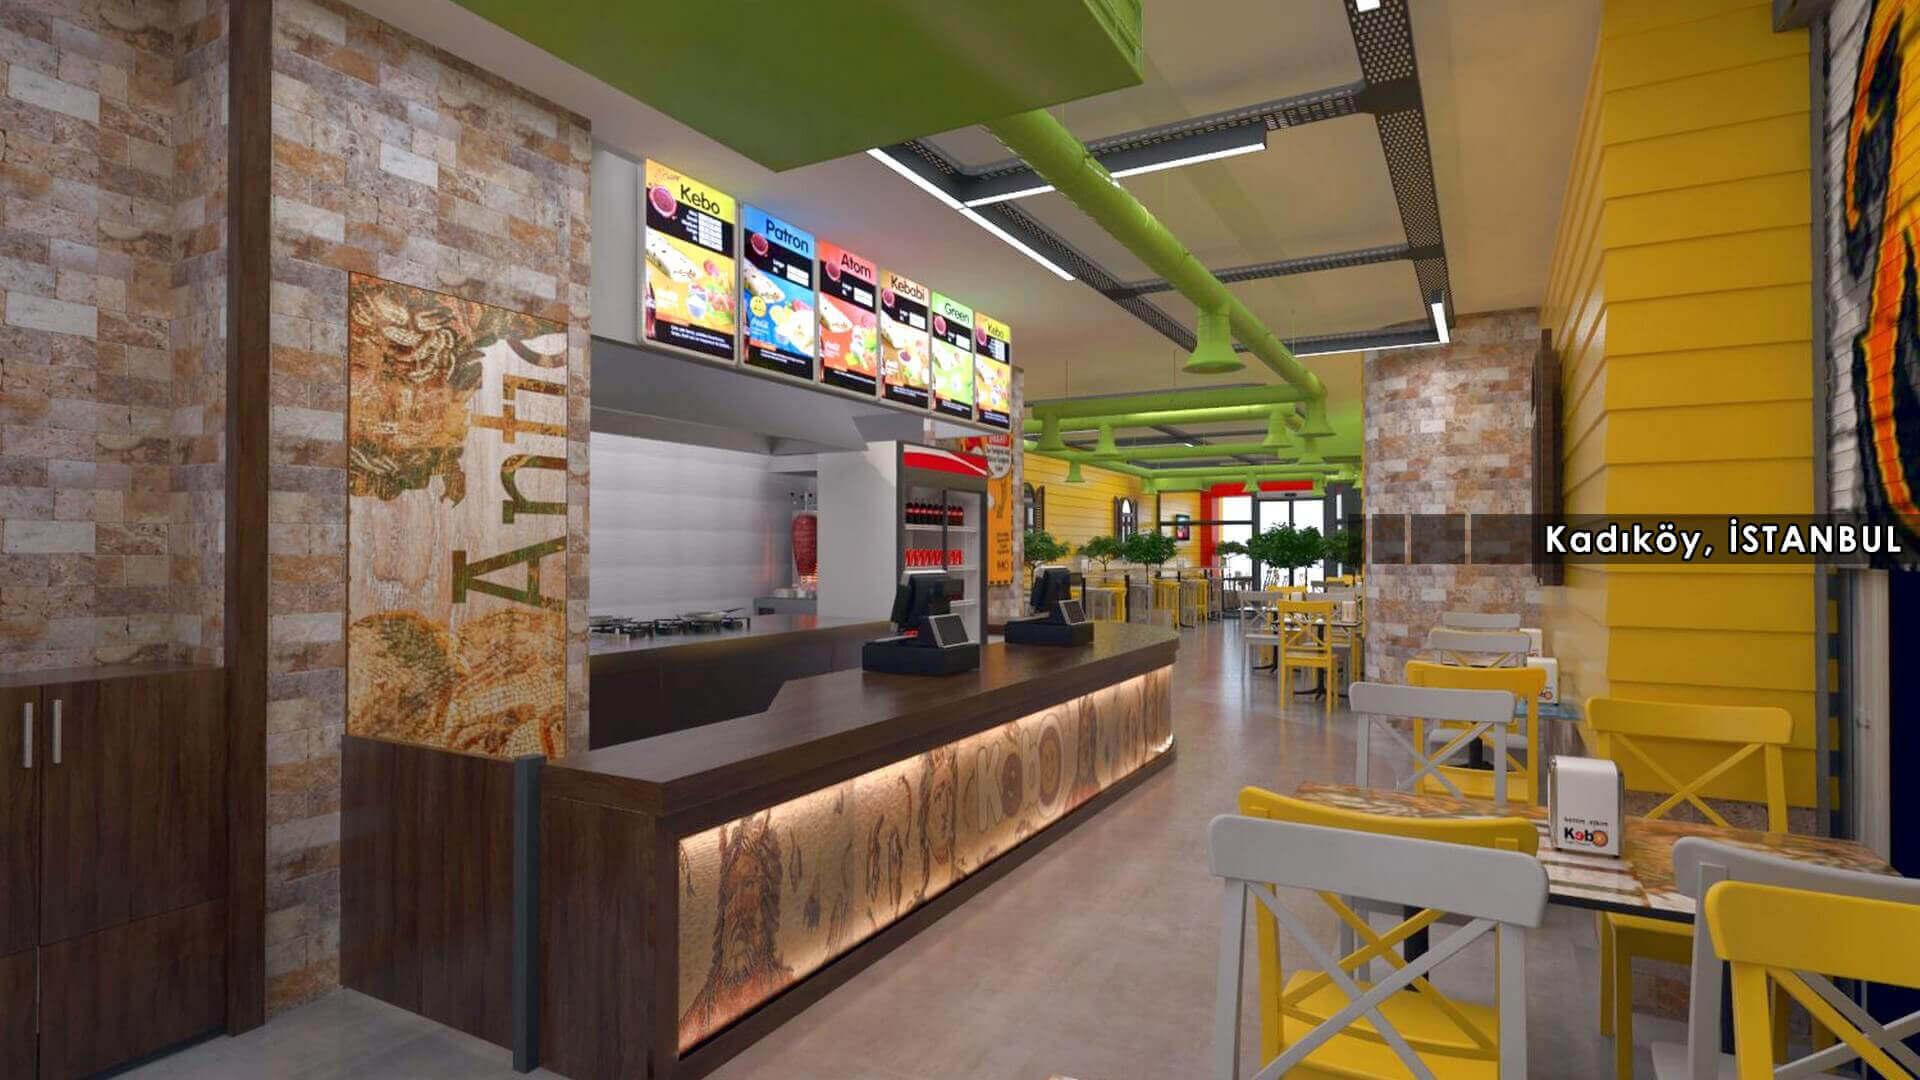 restoran tasarımı 2125 Kebo 2018 Restoranlar